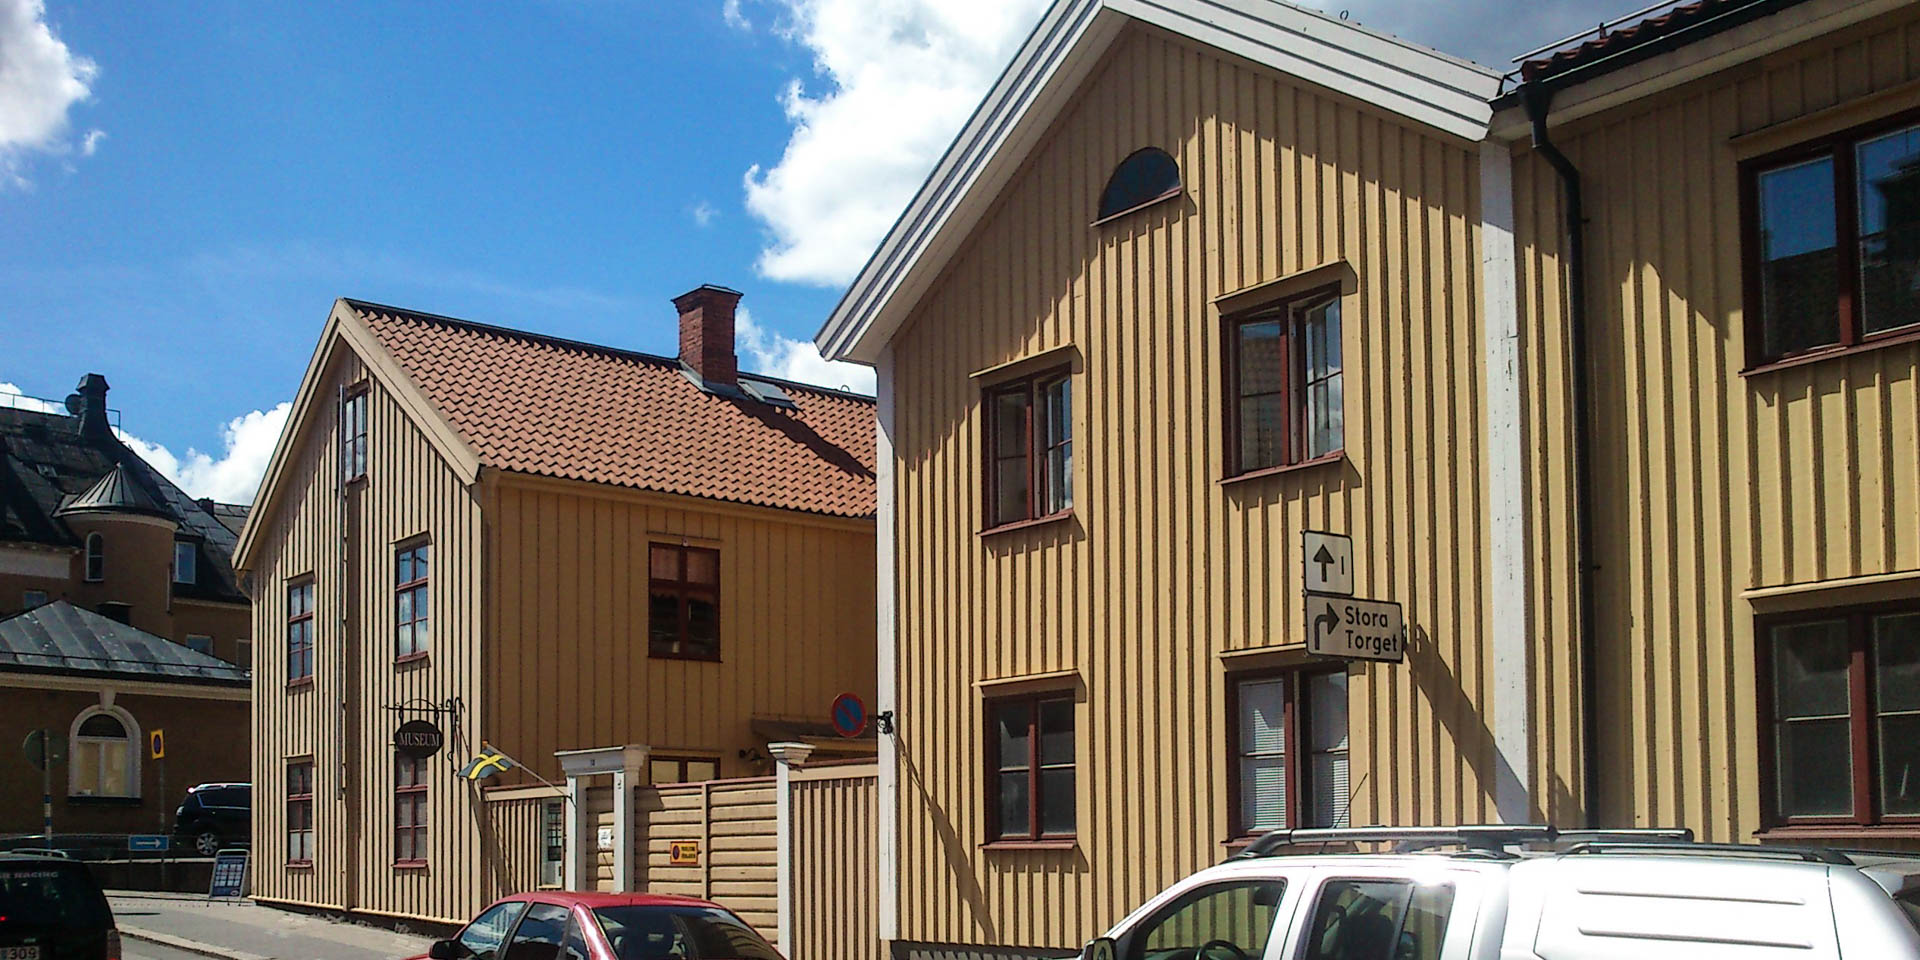 Stadsmuseet Näktergalen 2012